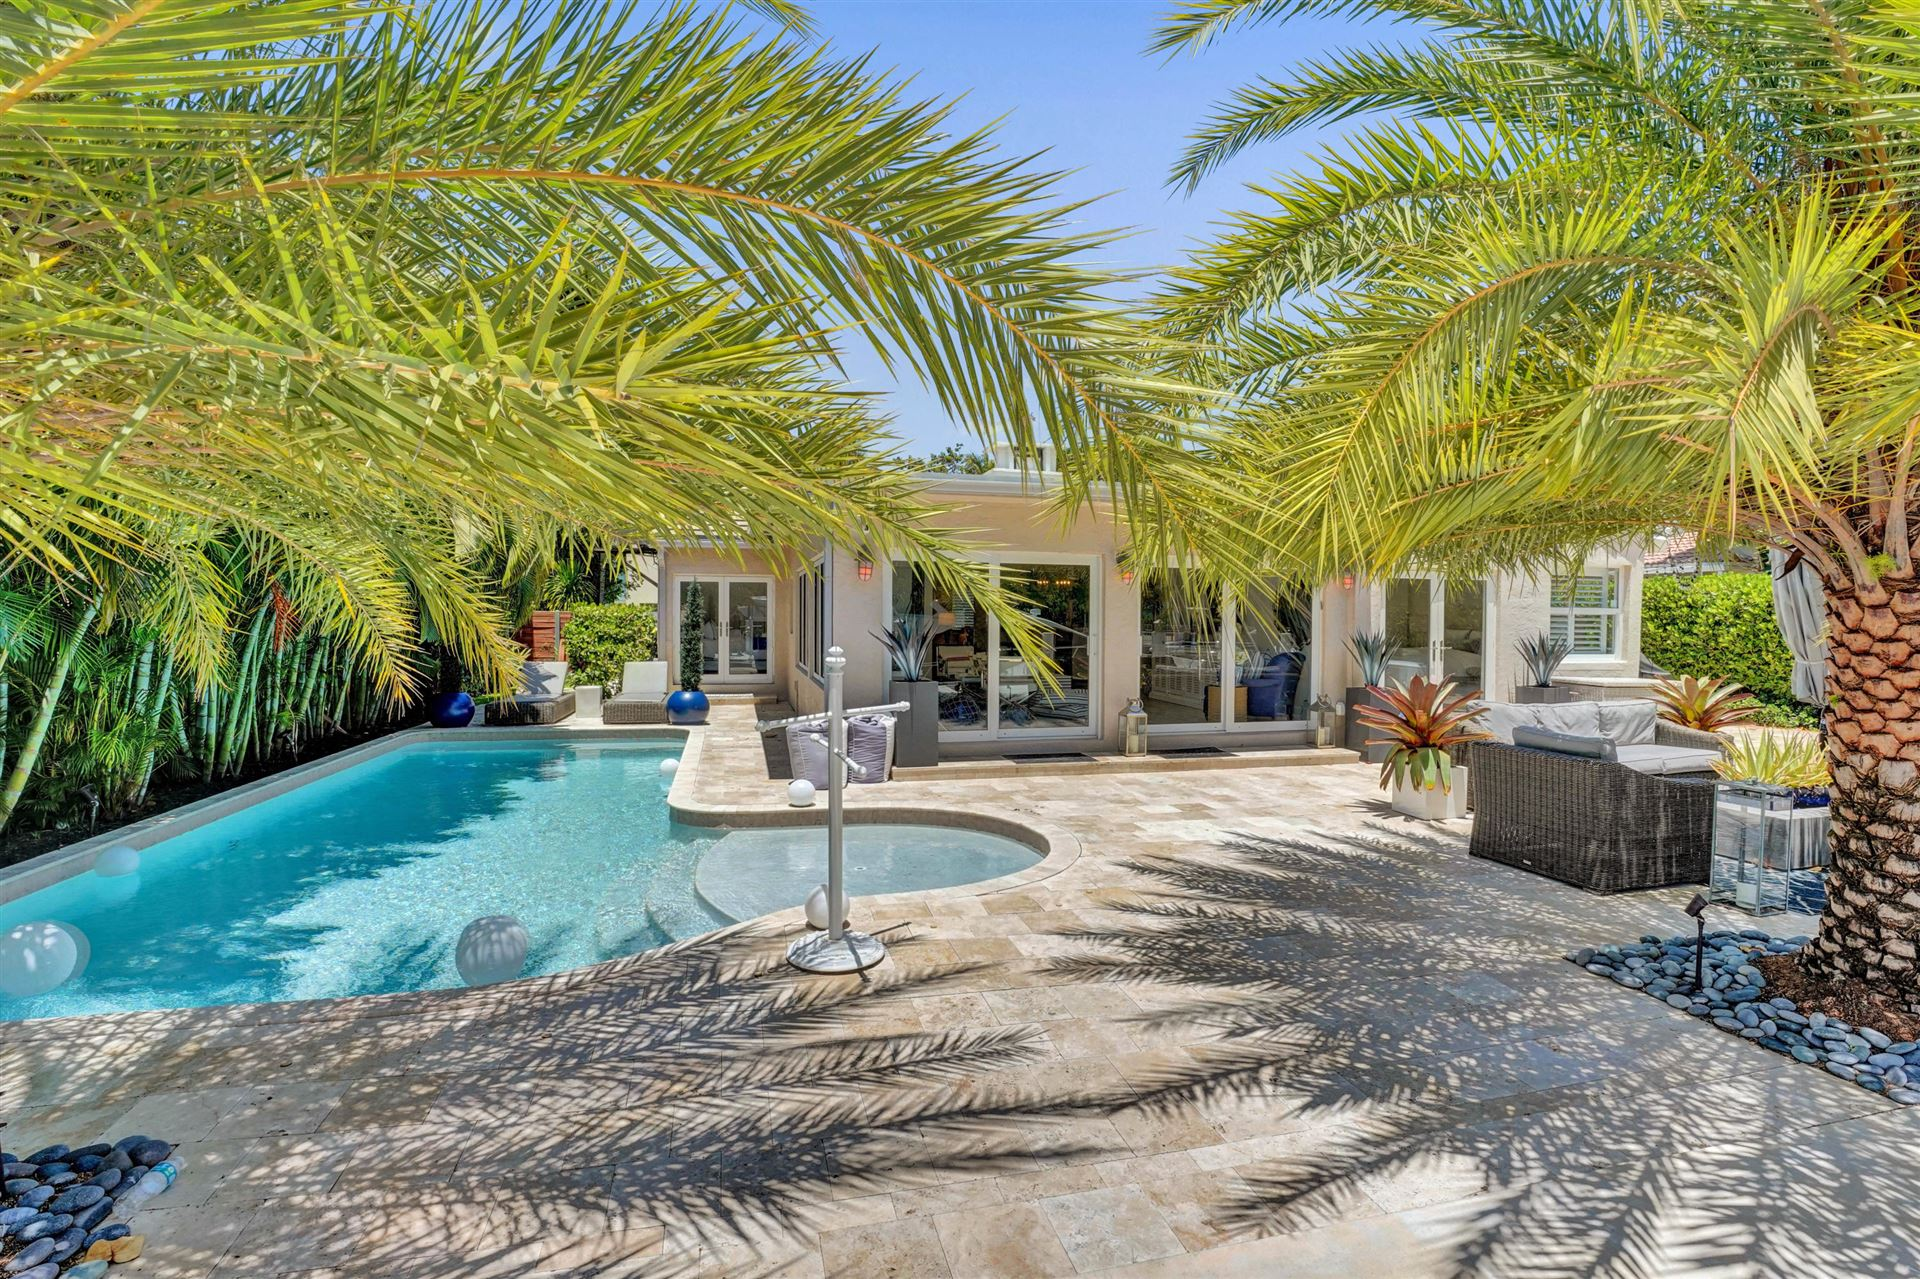 528 Victoria Terrace, Fort Lauderdale, FL 33301 - MLS#: RX-10719264